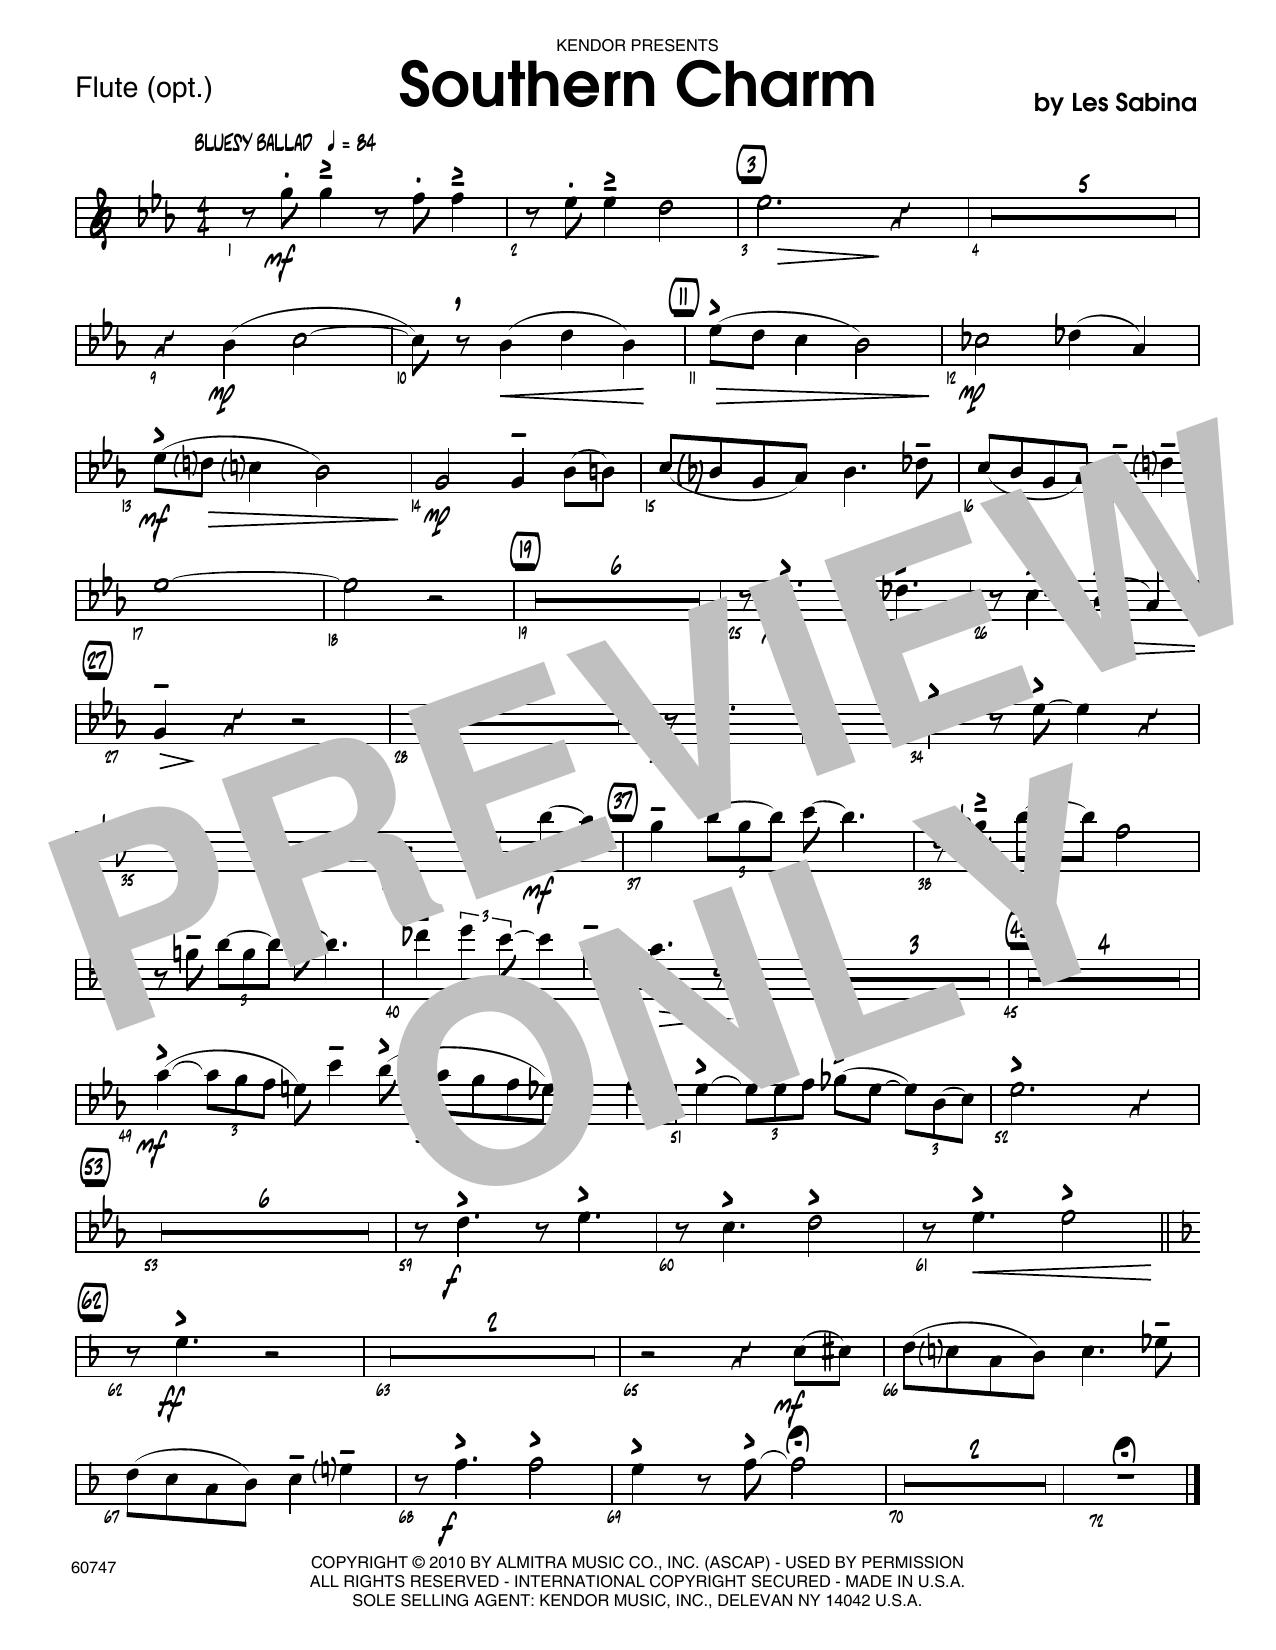 Southern Charm - Flute Sheet Music